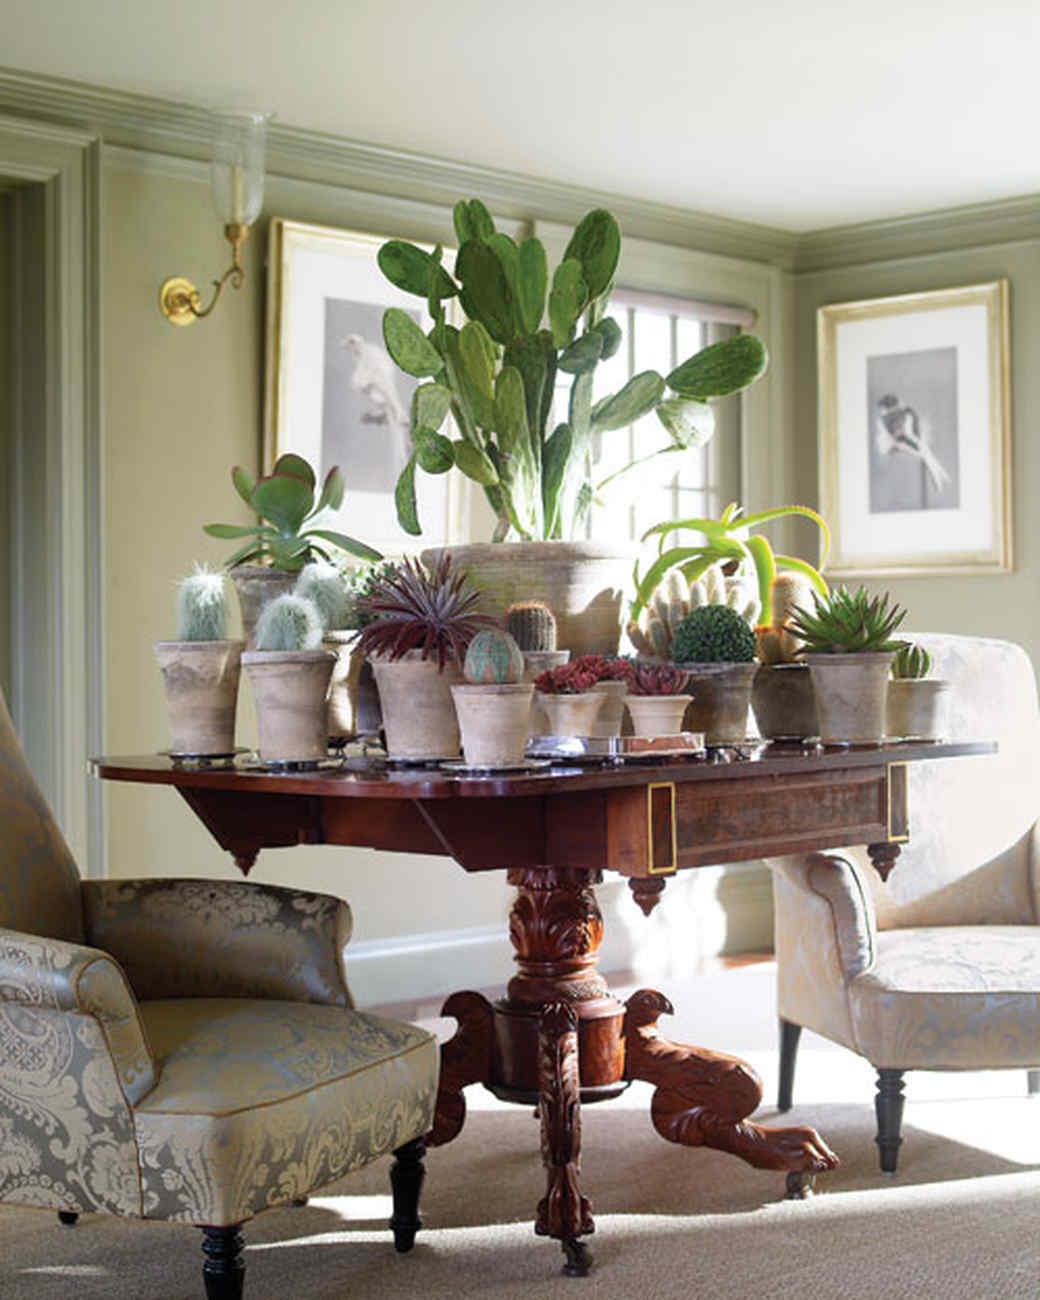 Martha' Home Decorating With Houseplants Martha Stewart